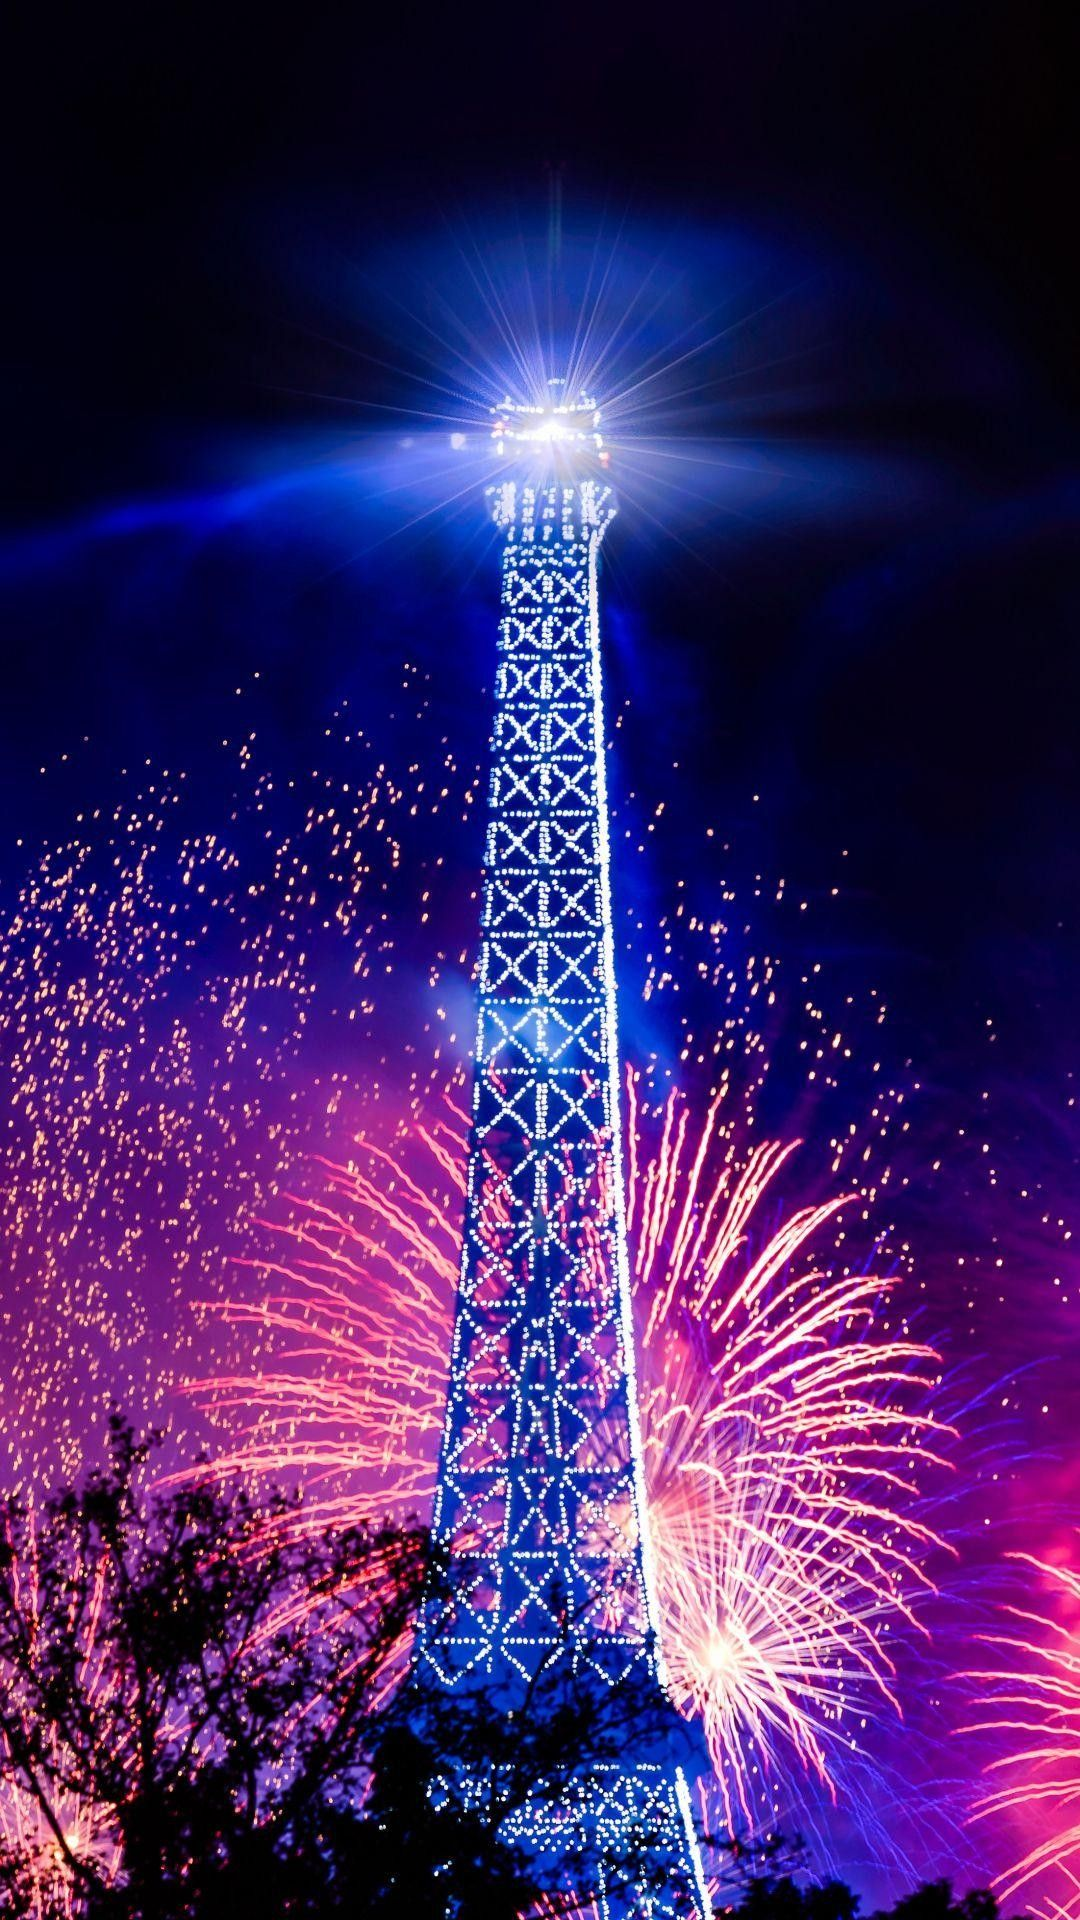 Fireworks image by darkladyaris Fireworks wallpaper